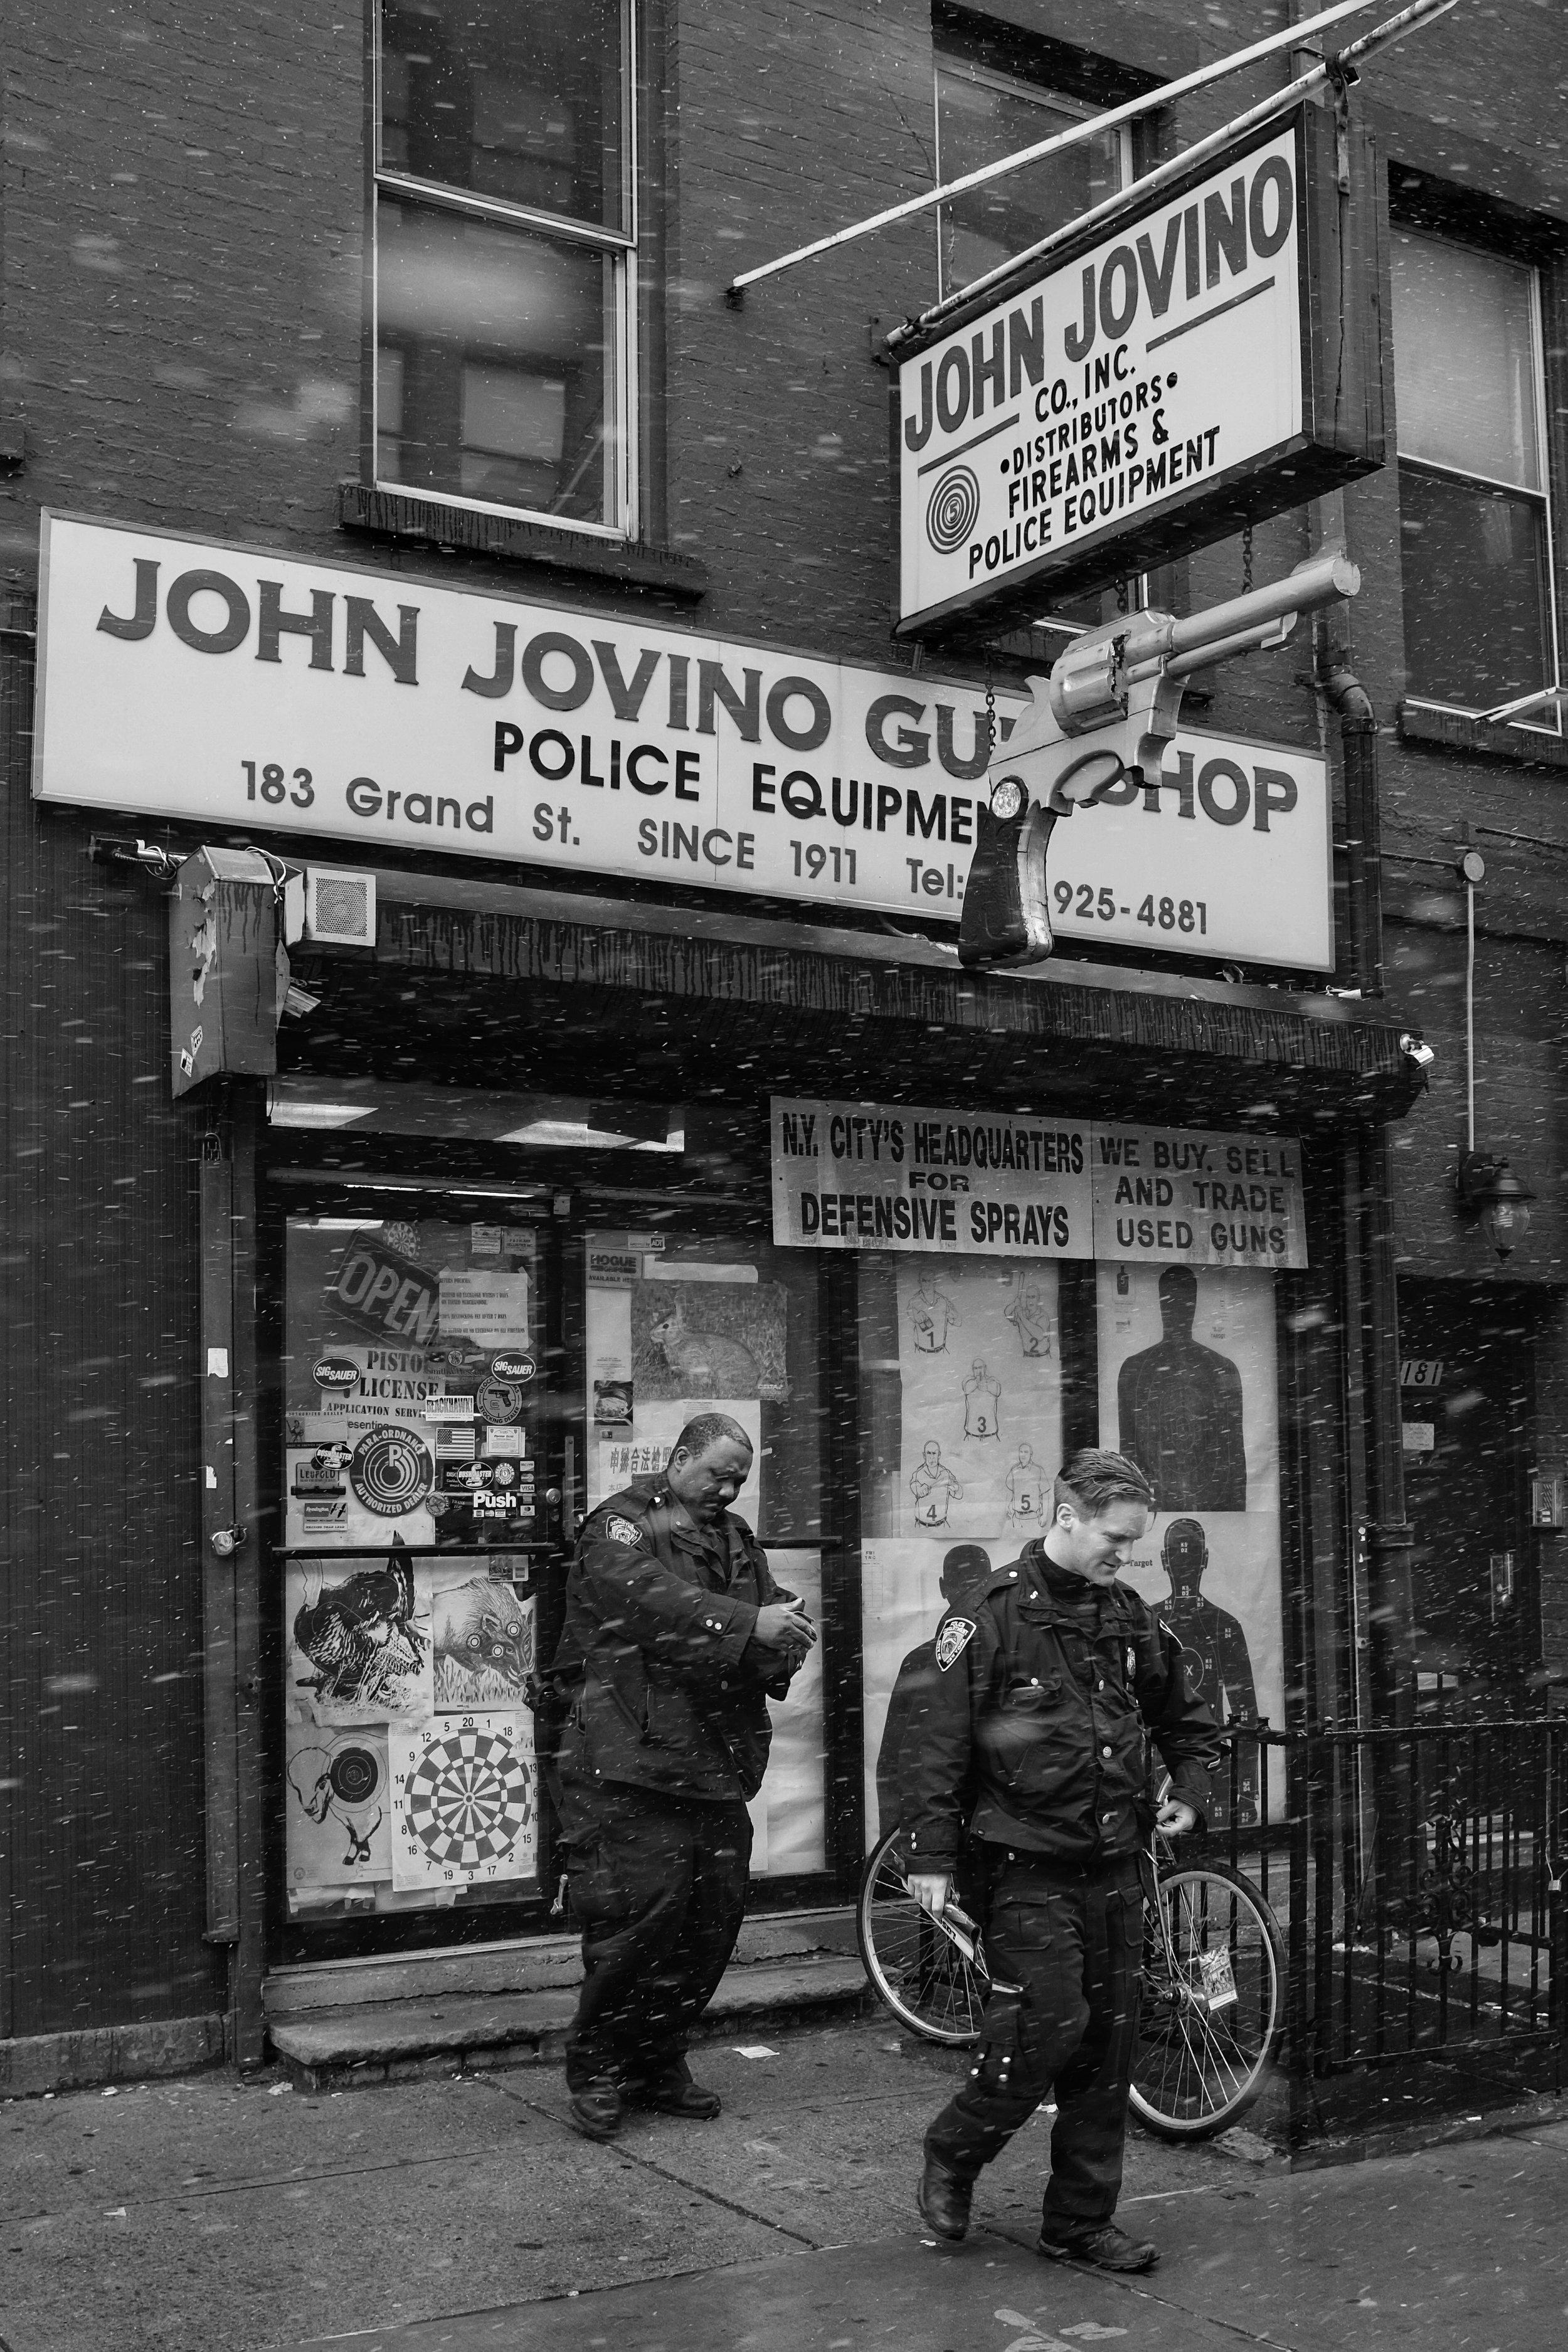 John Jovino Gun Shop. Grand Street. Little Italy. New York City. 2017